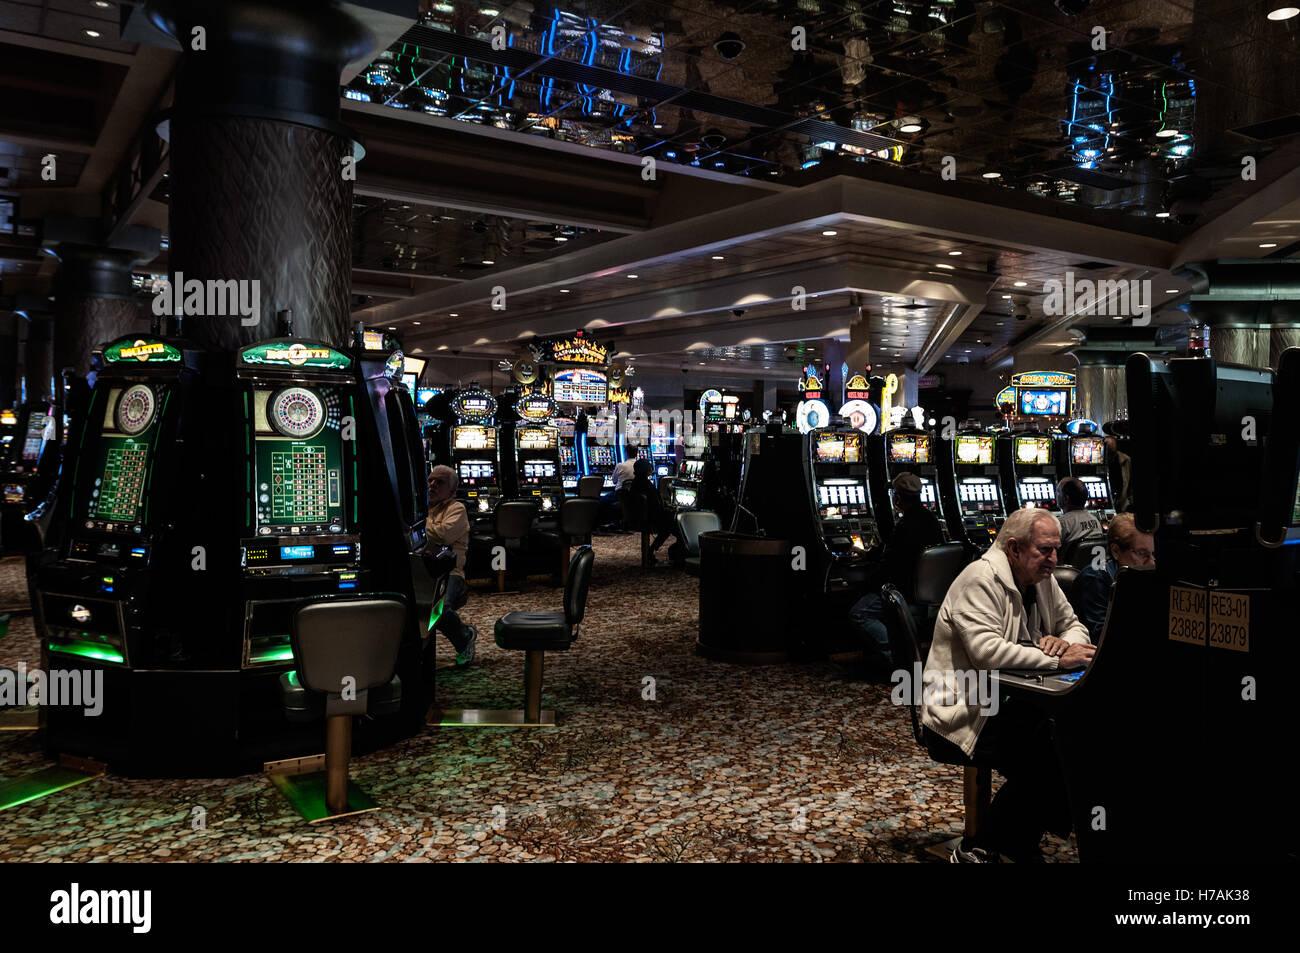 Men sit gambling at slot machines, Foxwoods Resort Casino interior, Ledyard, Connecticut, USA - Stock Image